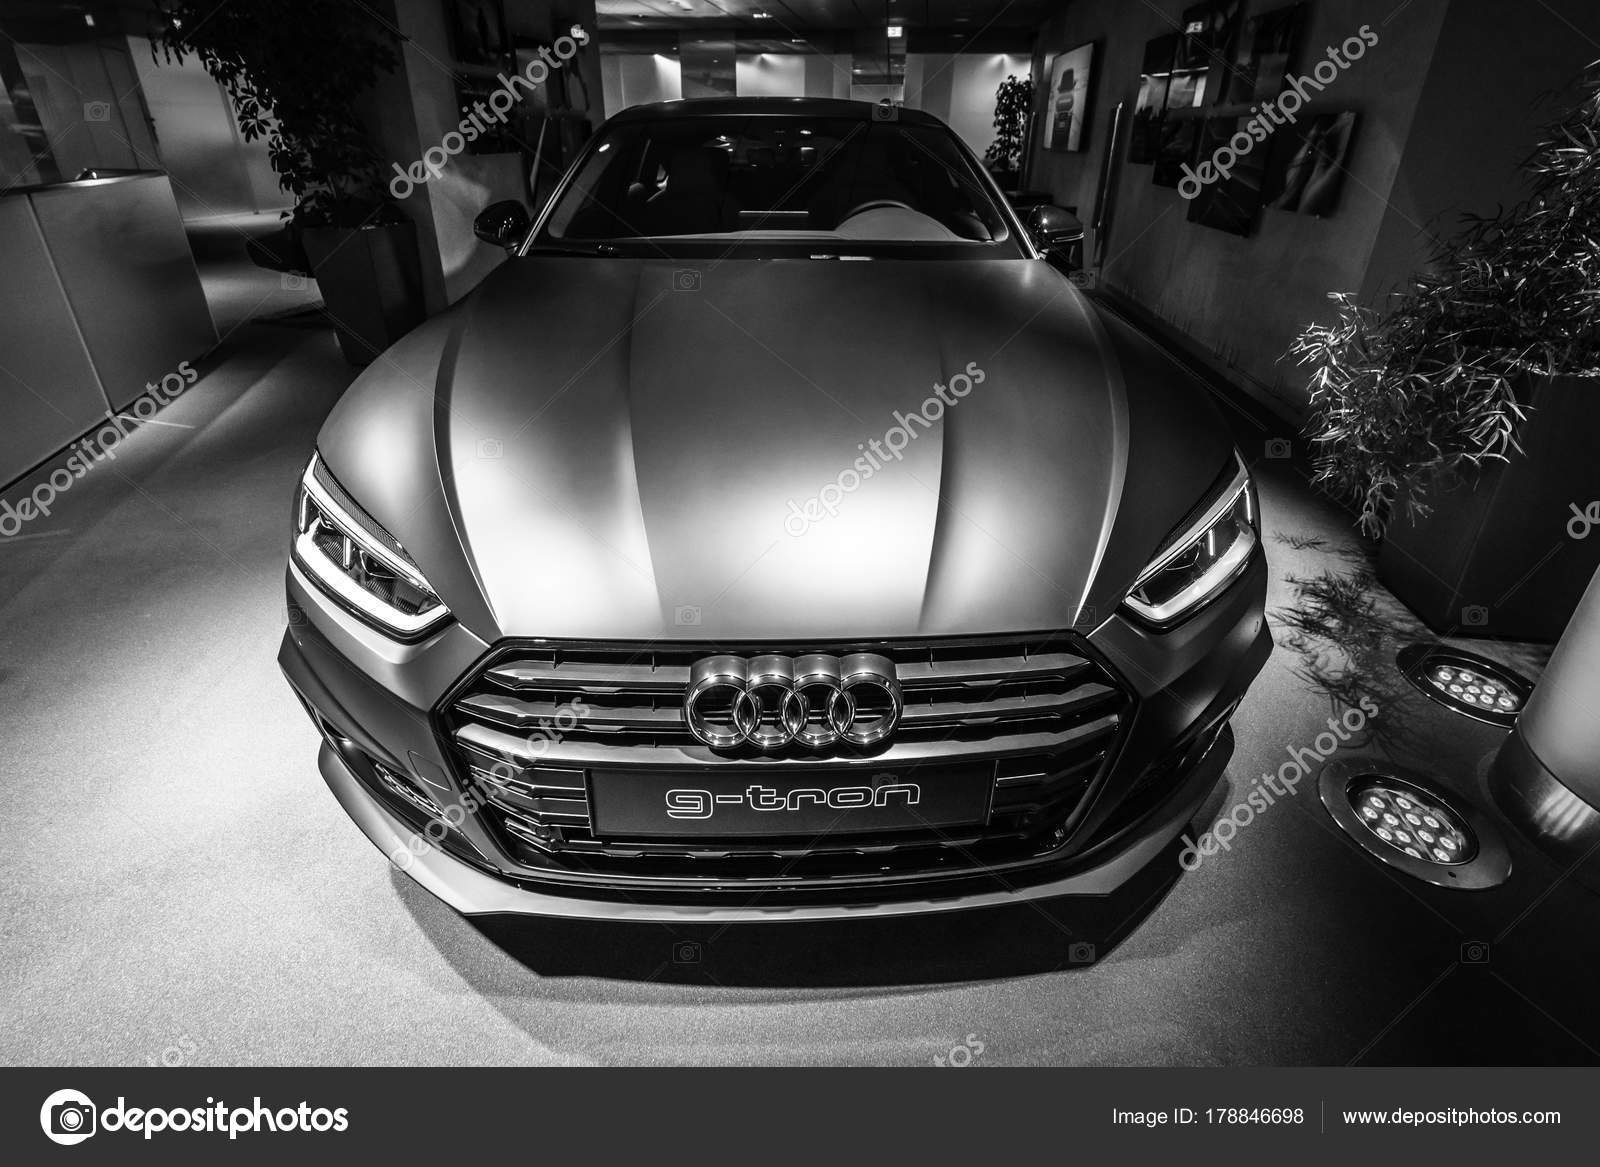 Berlin Dezember 2017 Showroom Kompakte Executive Auto Audi Sportback